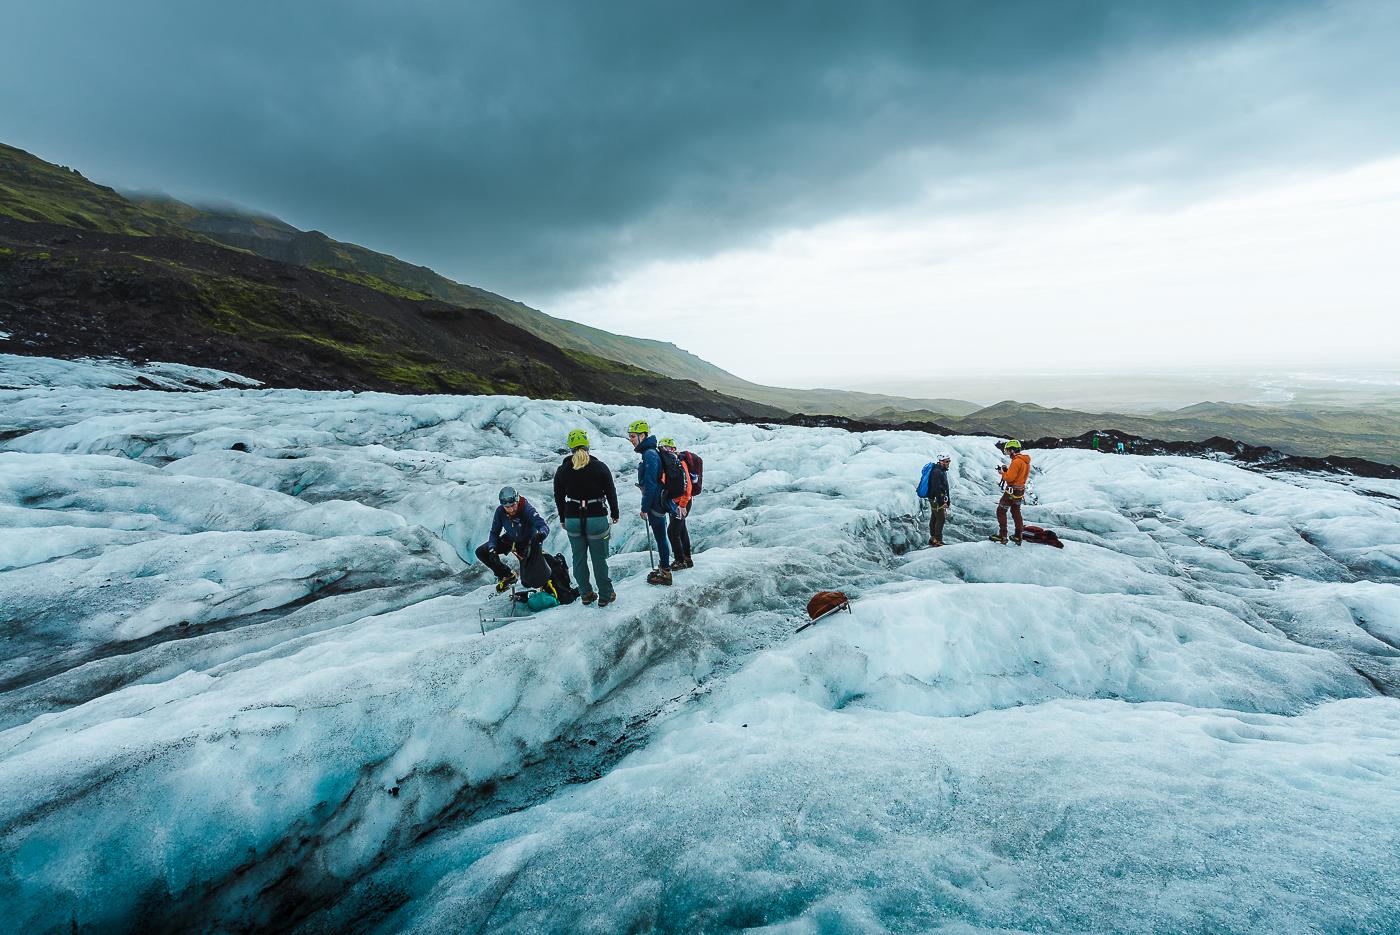 gabornagy_photography_iceland_glacier9.jpg